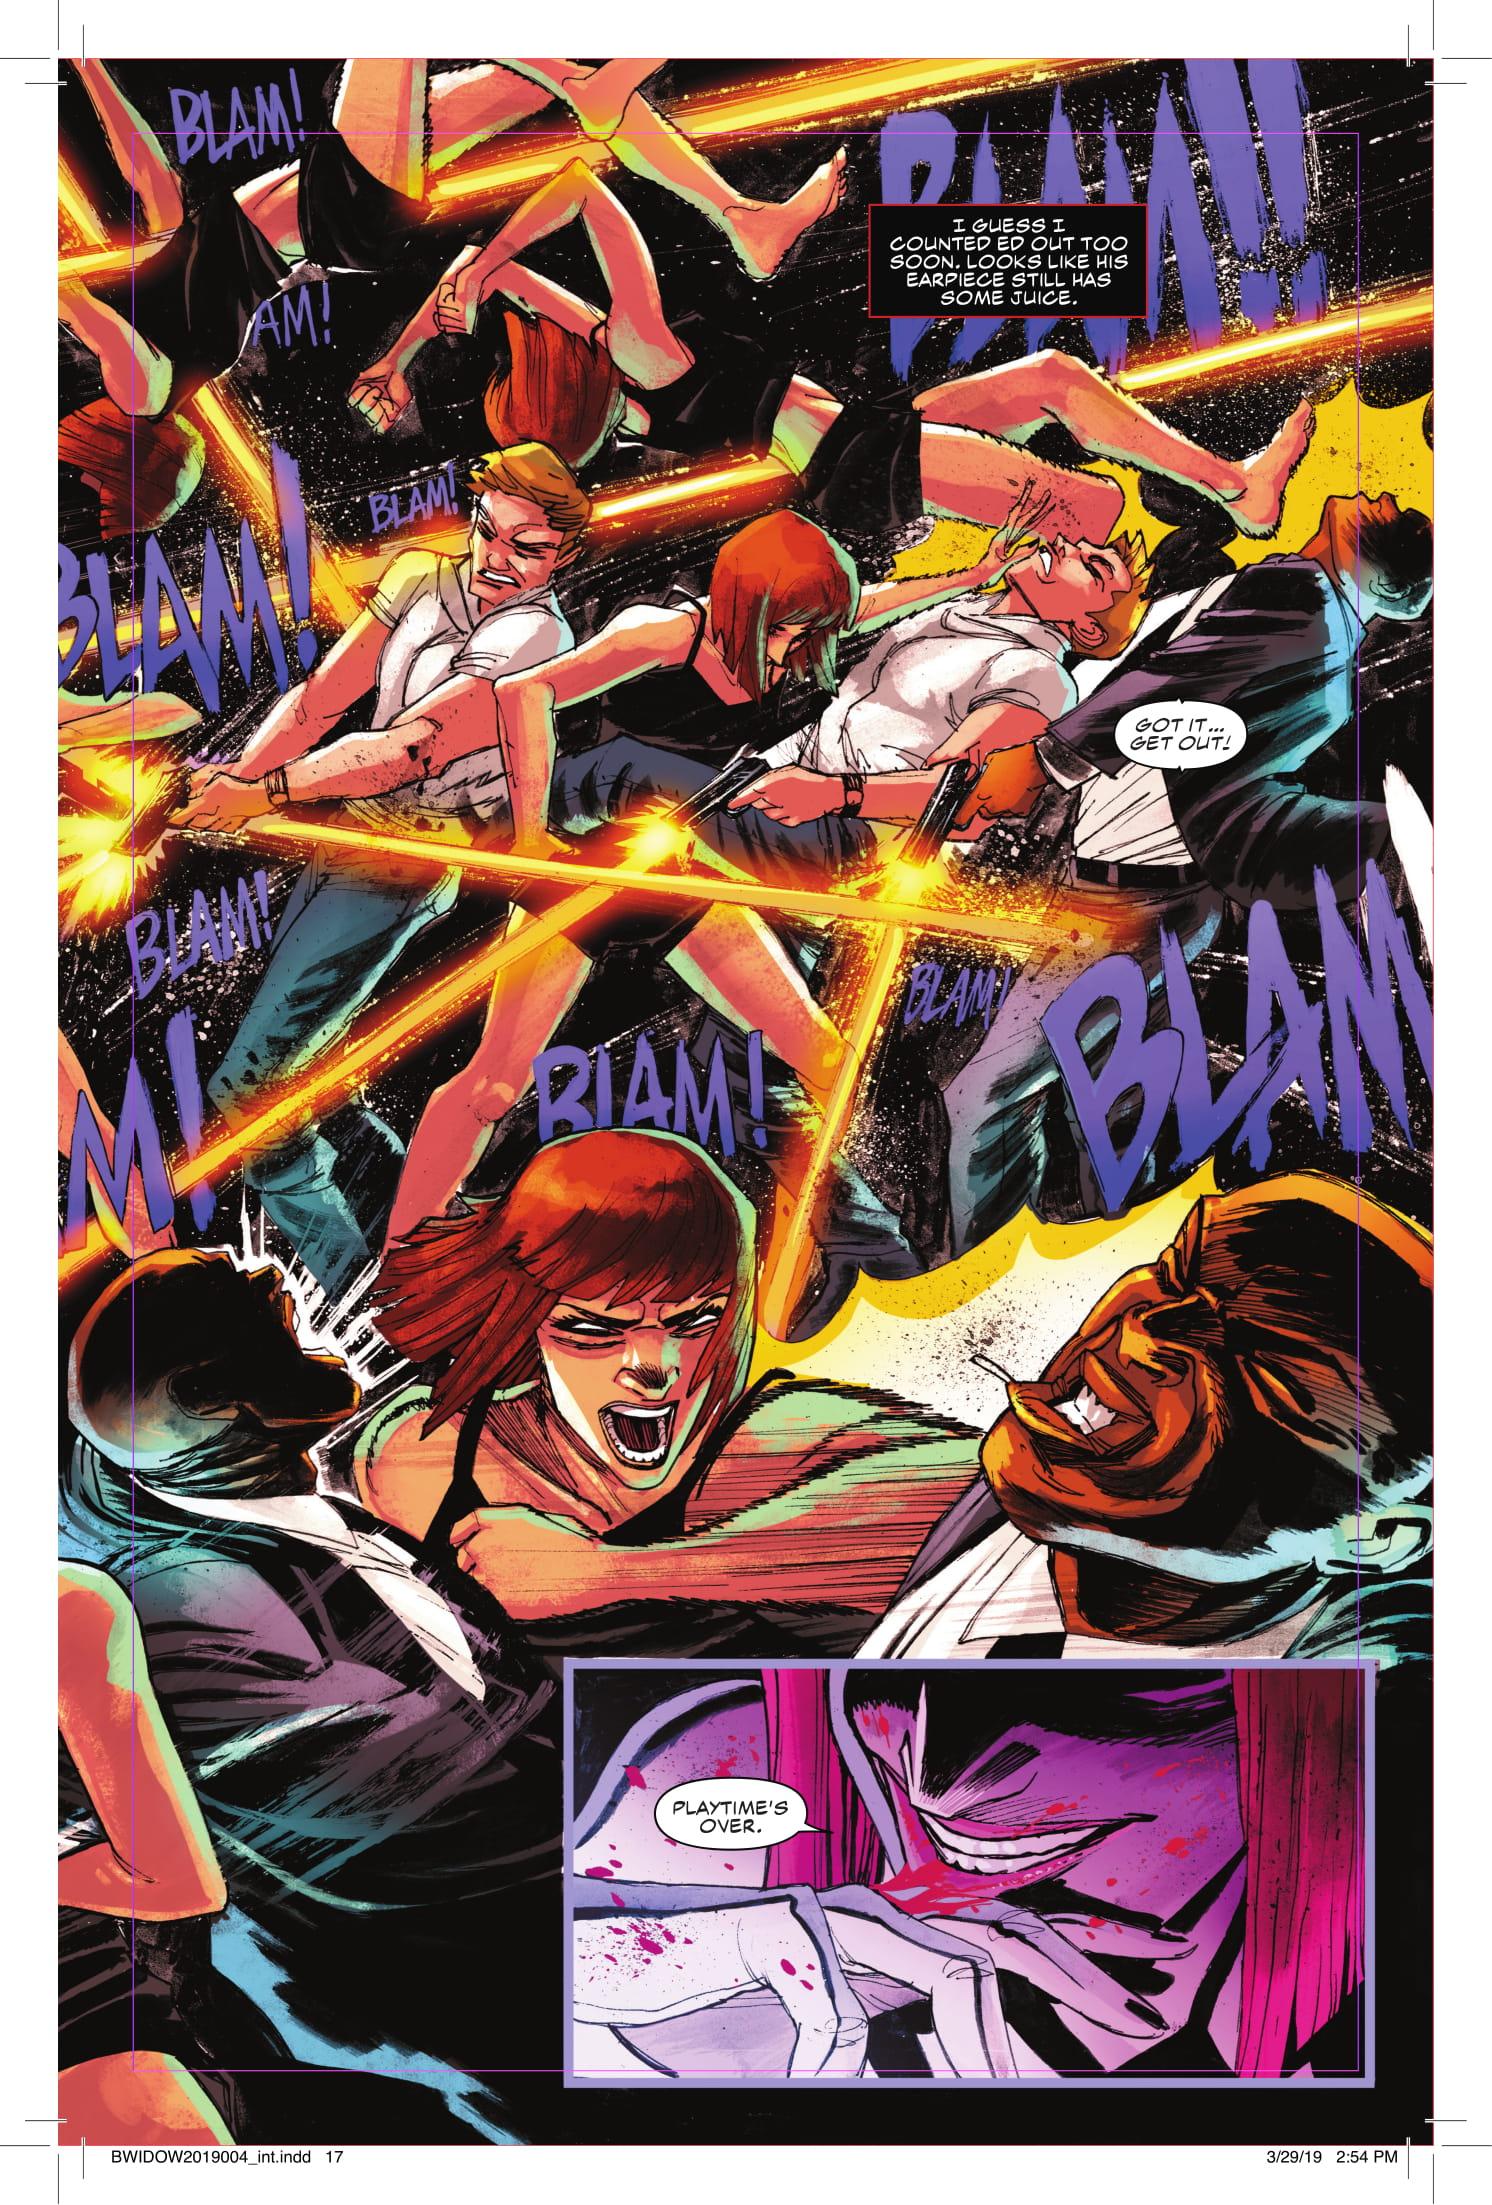 Black Widow #4 page 4